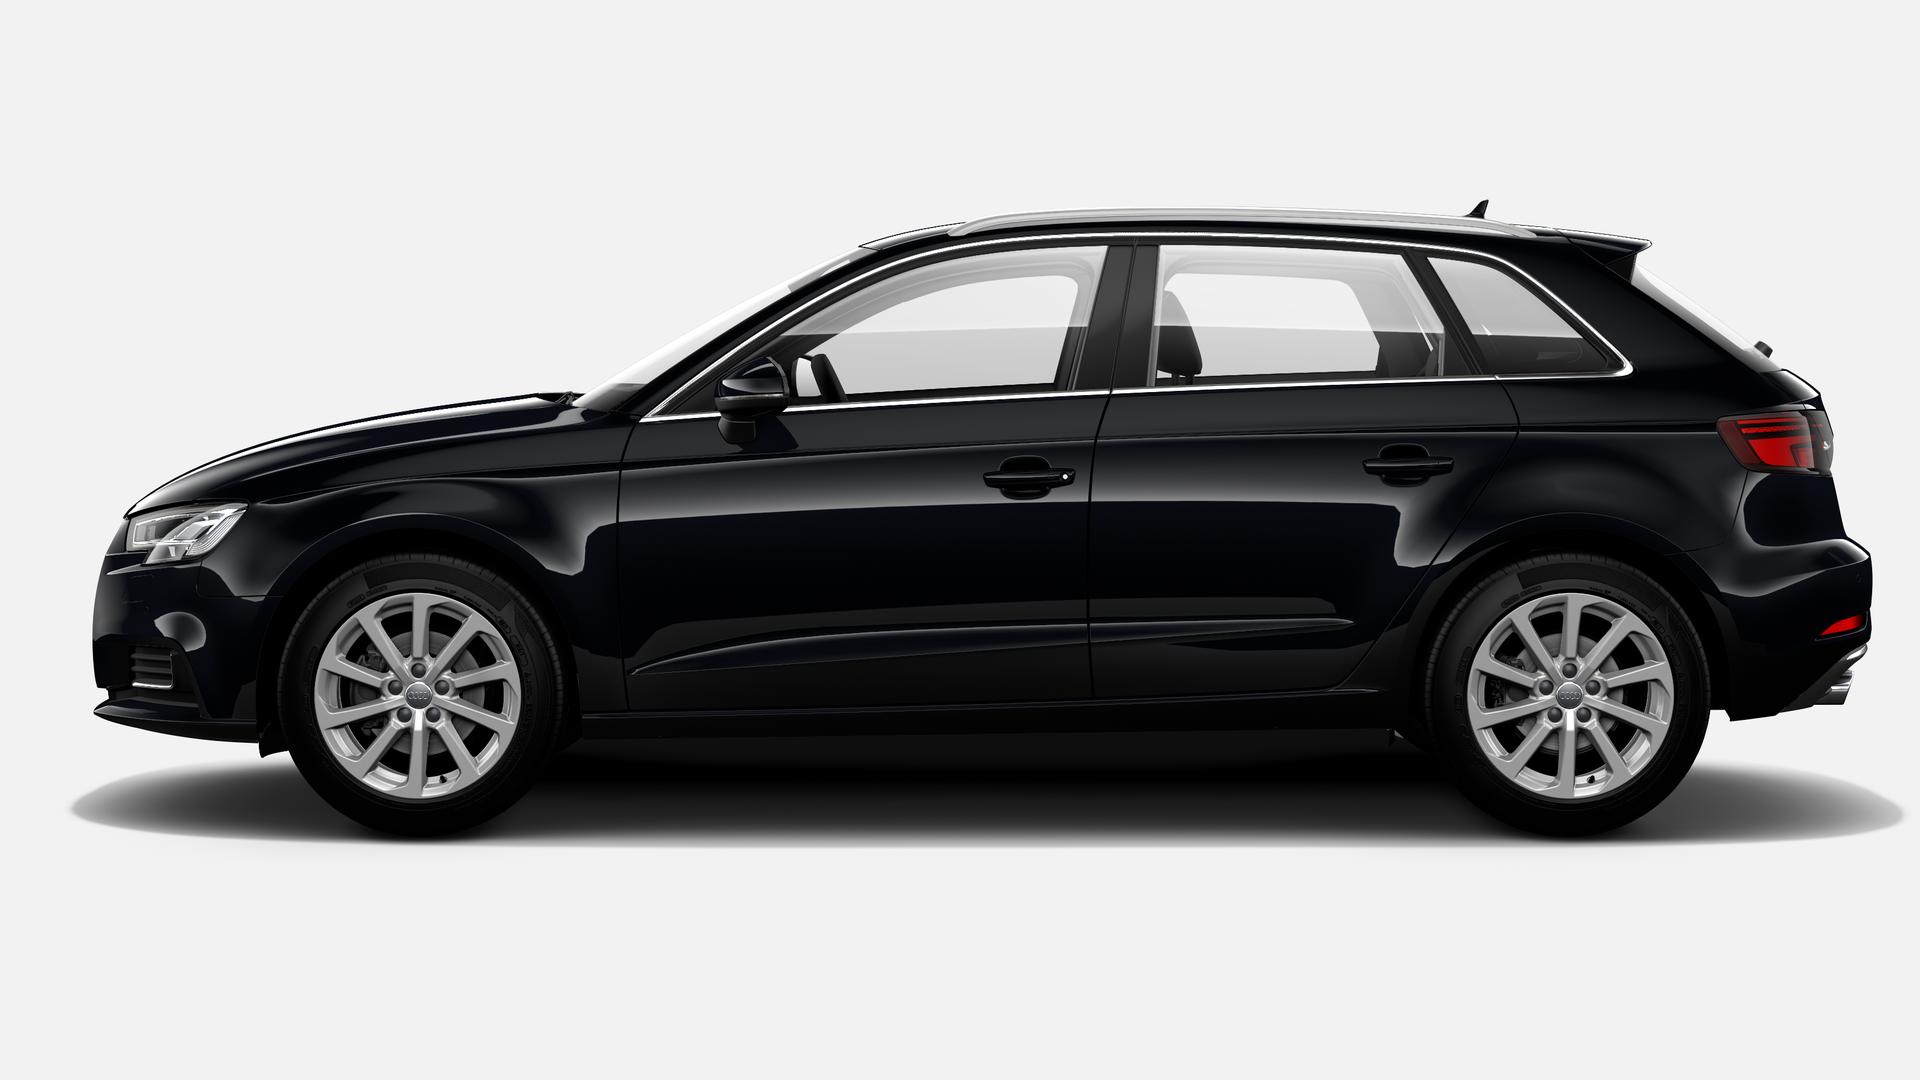 Vista Lateral izquierda de Audi A3 Sportback 30 TDI Design S-tronic  85 kW (116 CV)